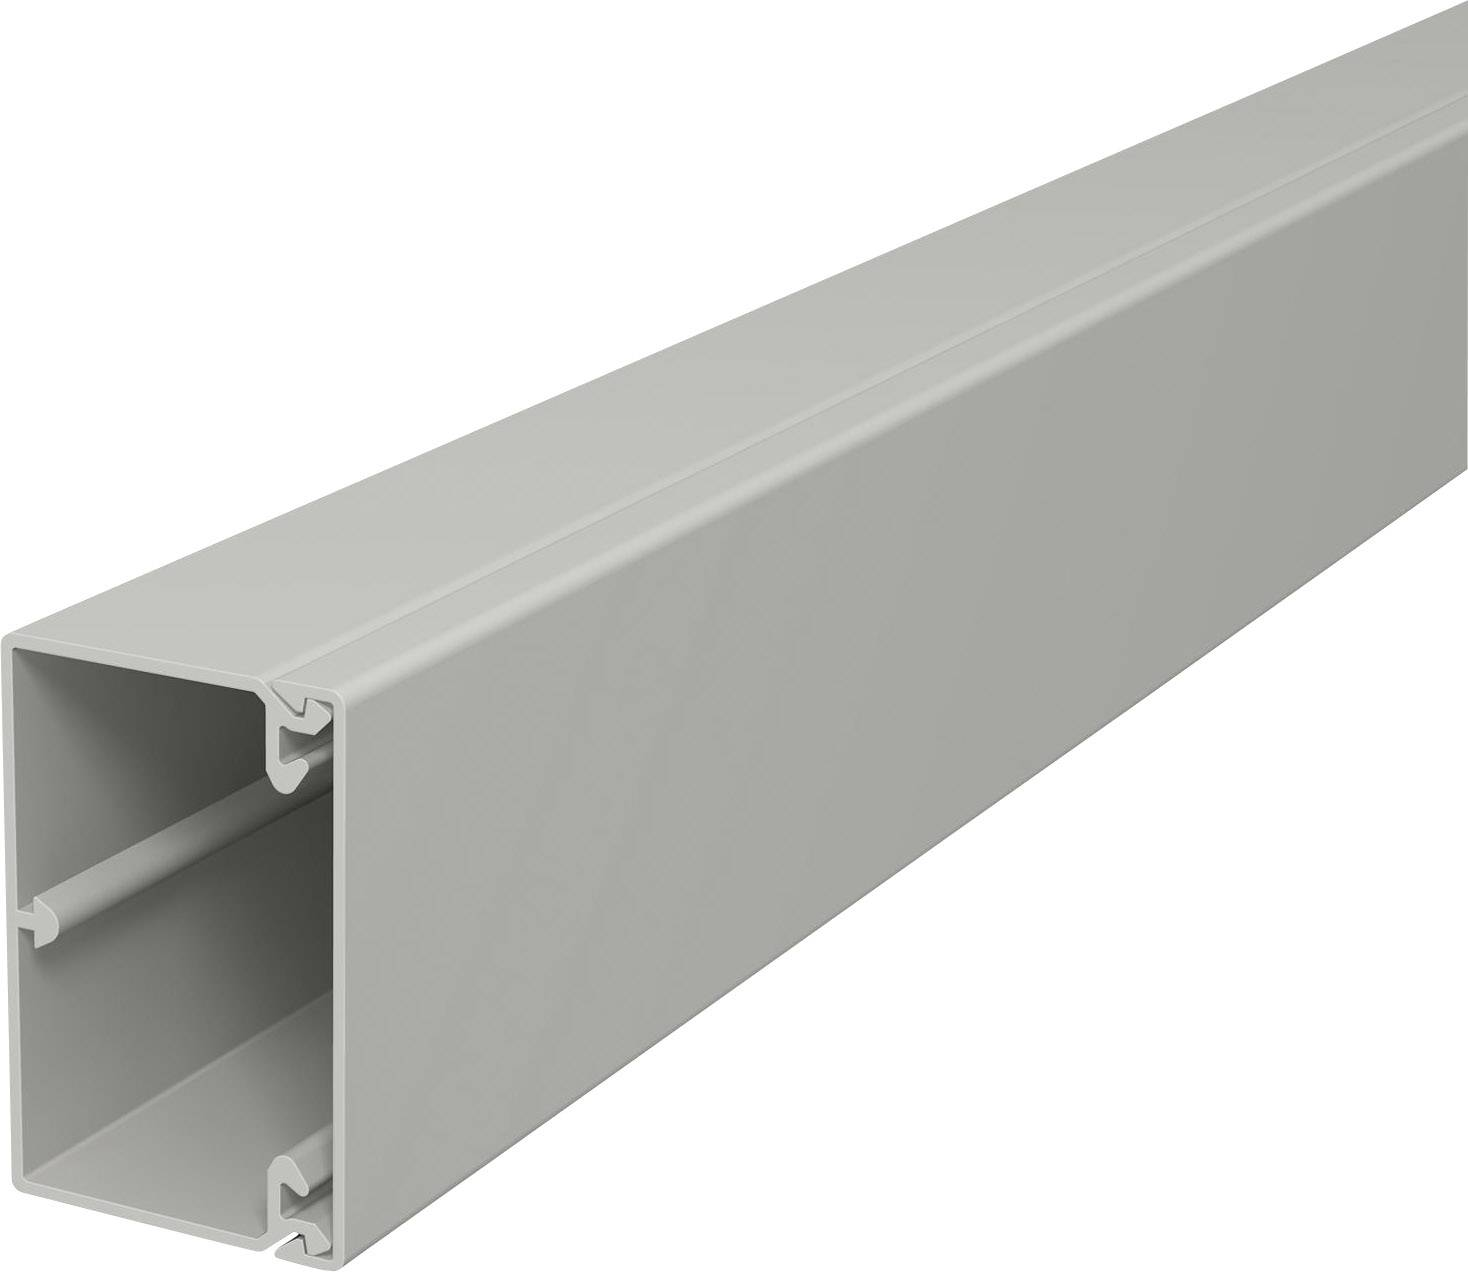 Elektroinstalační lišta s krytem OBO Bettermann, 6189601, 60 x 40 mm, 2 m, šedá